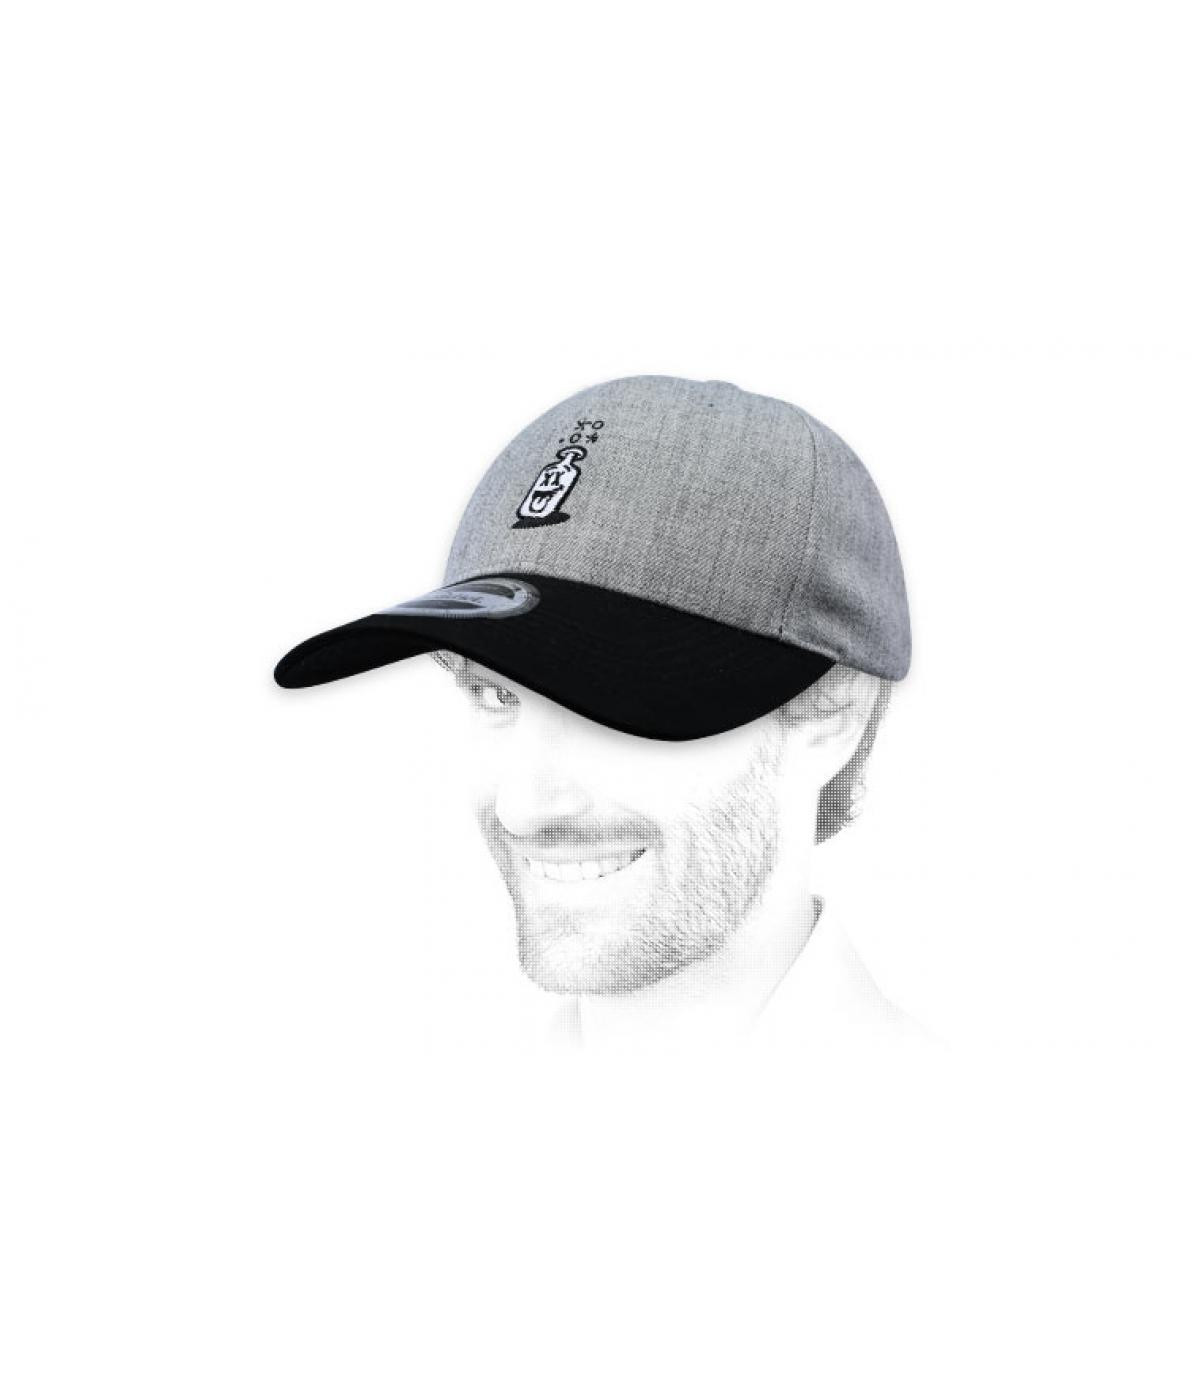 gorra botella blanco negro